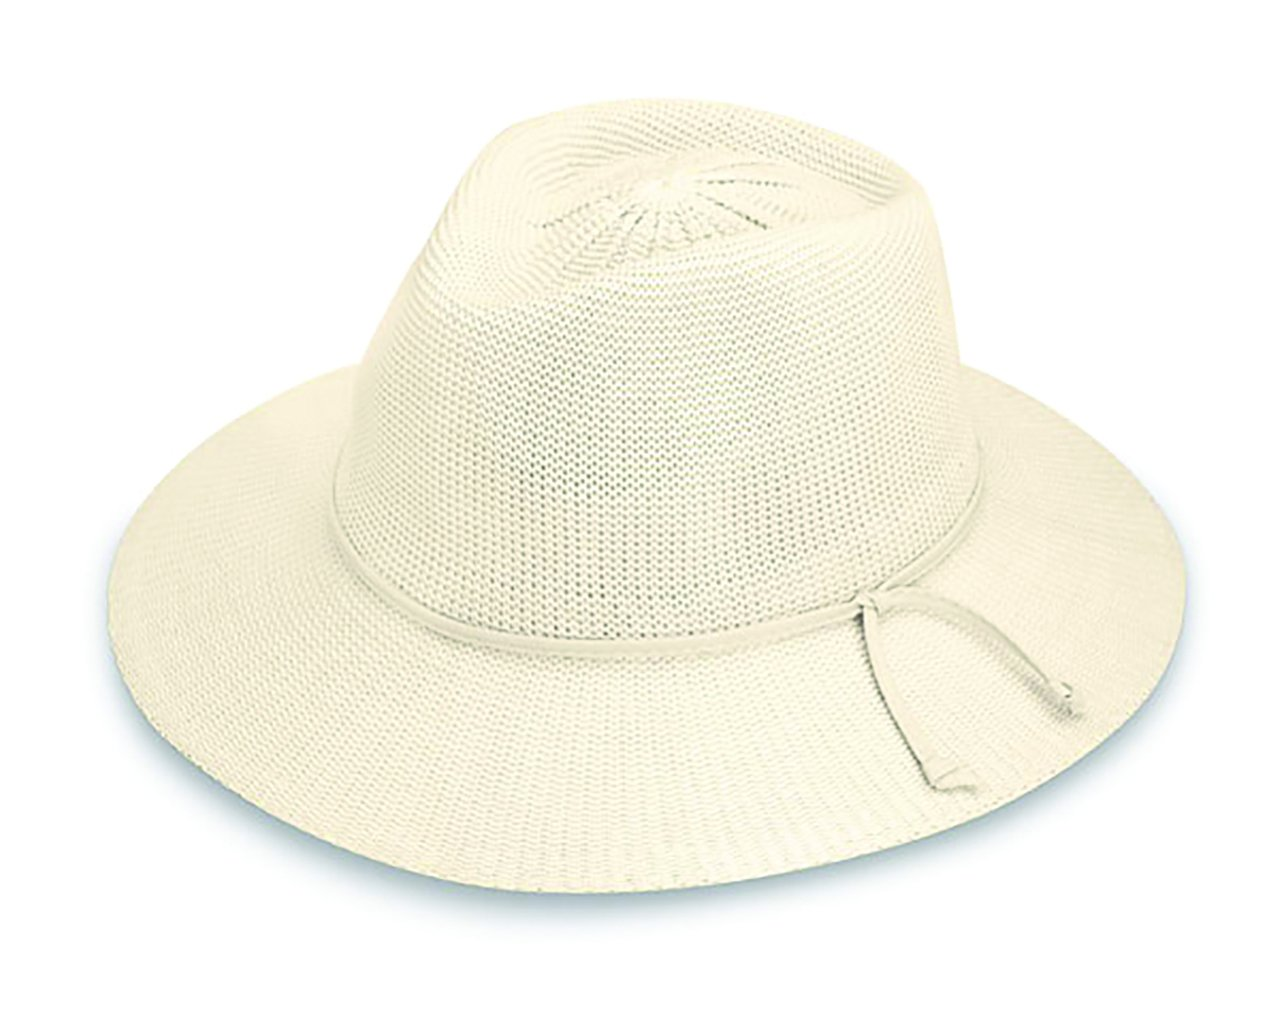 75b0183433bc6 Wallaroo Hat Company Women s Victoria Fedora Sun Hat - Natural - UPF ...